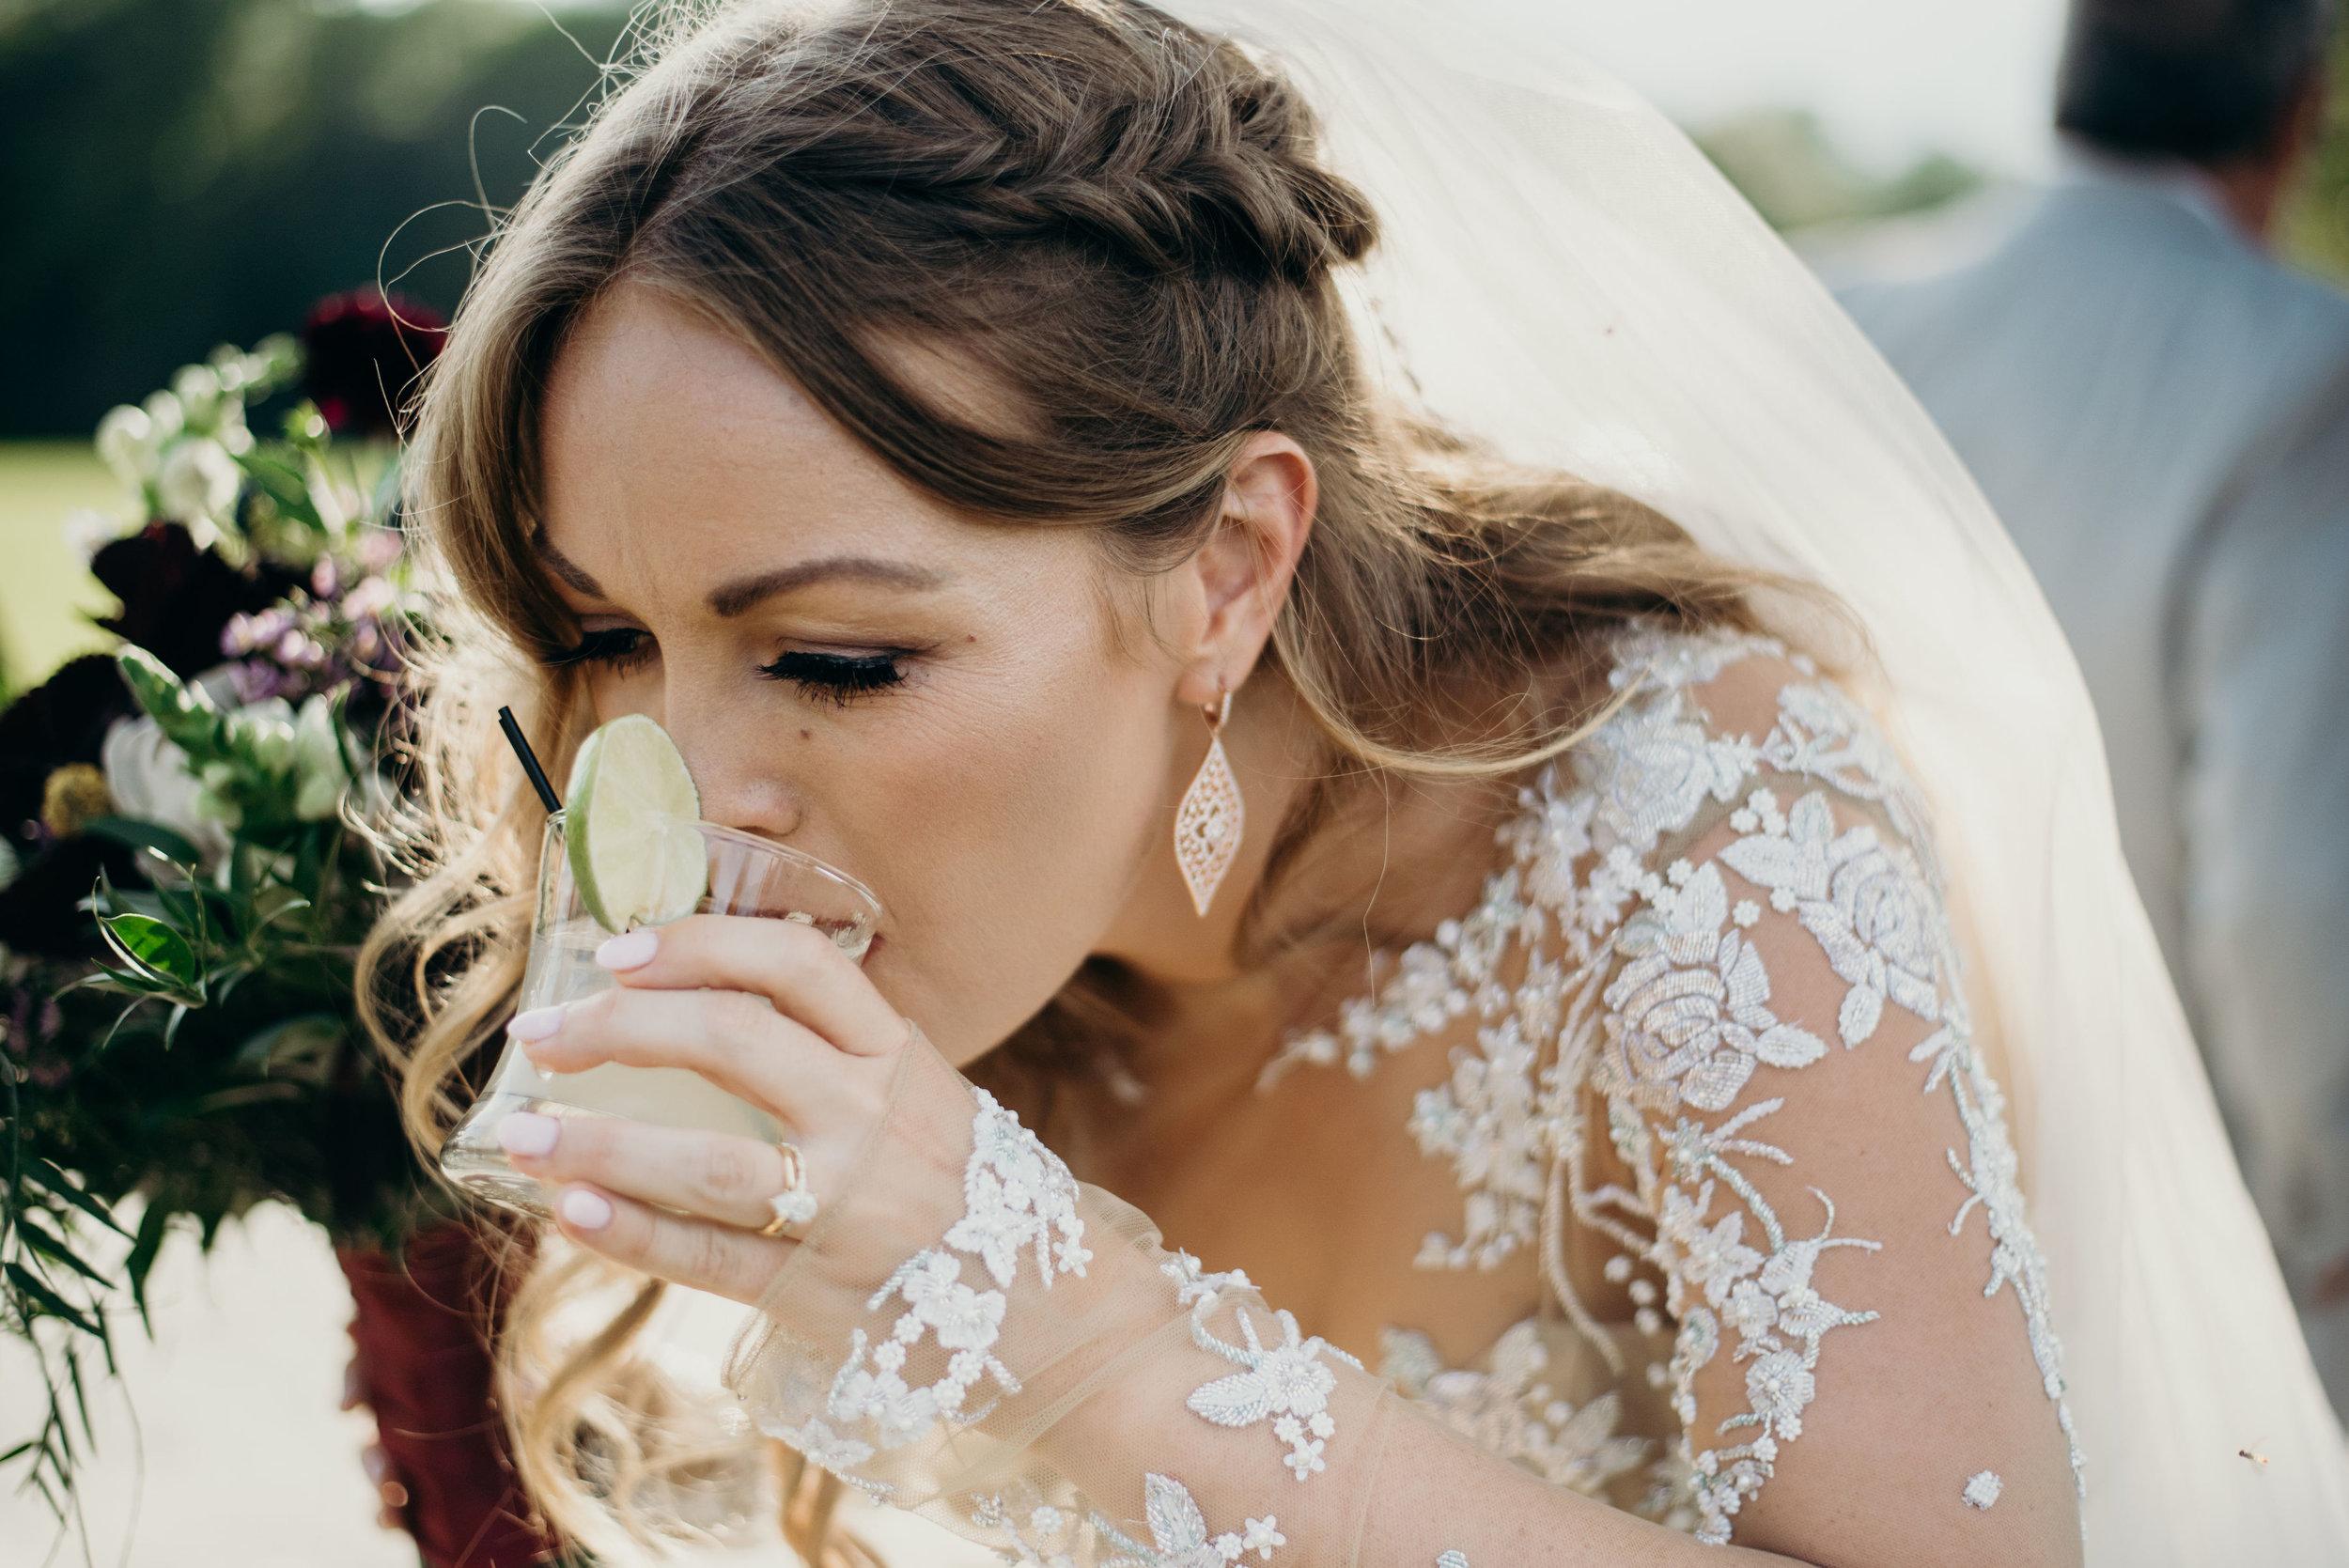 I just love this so much. Lauren is my kind of bride! #bridegoals